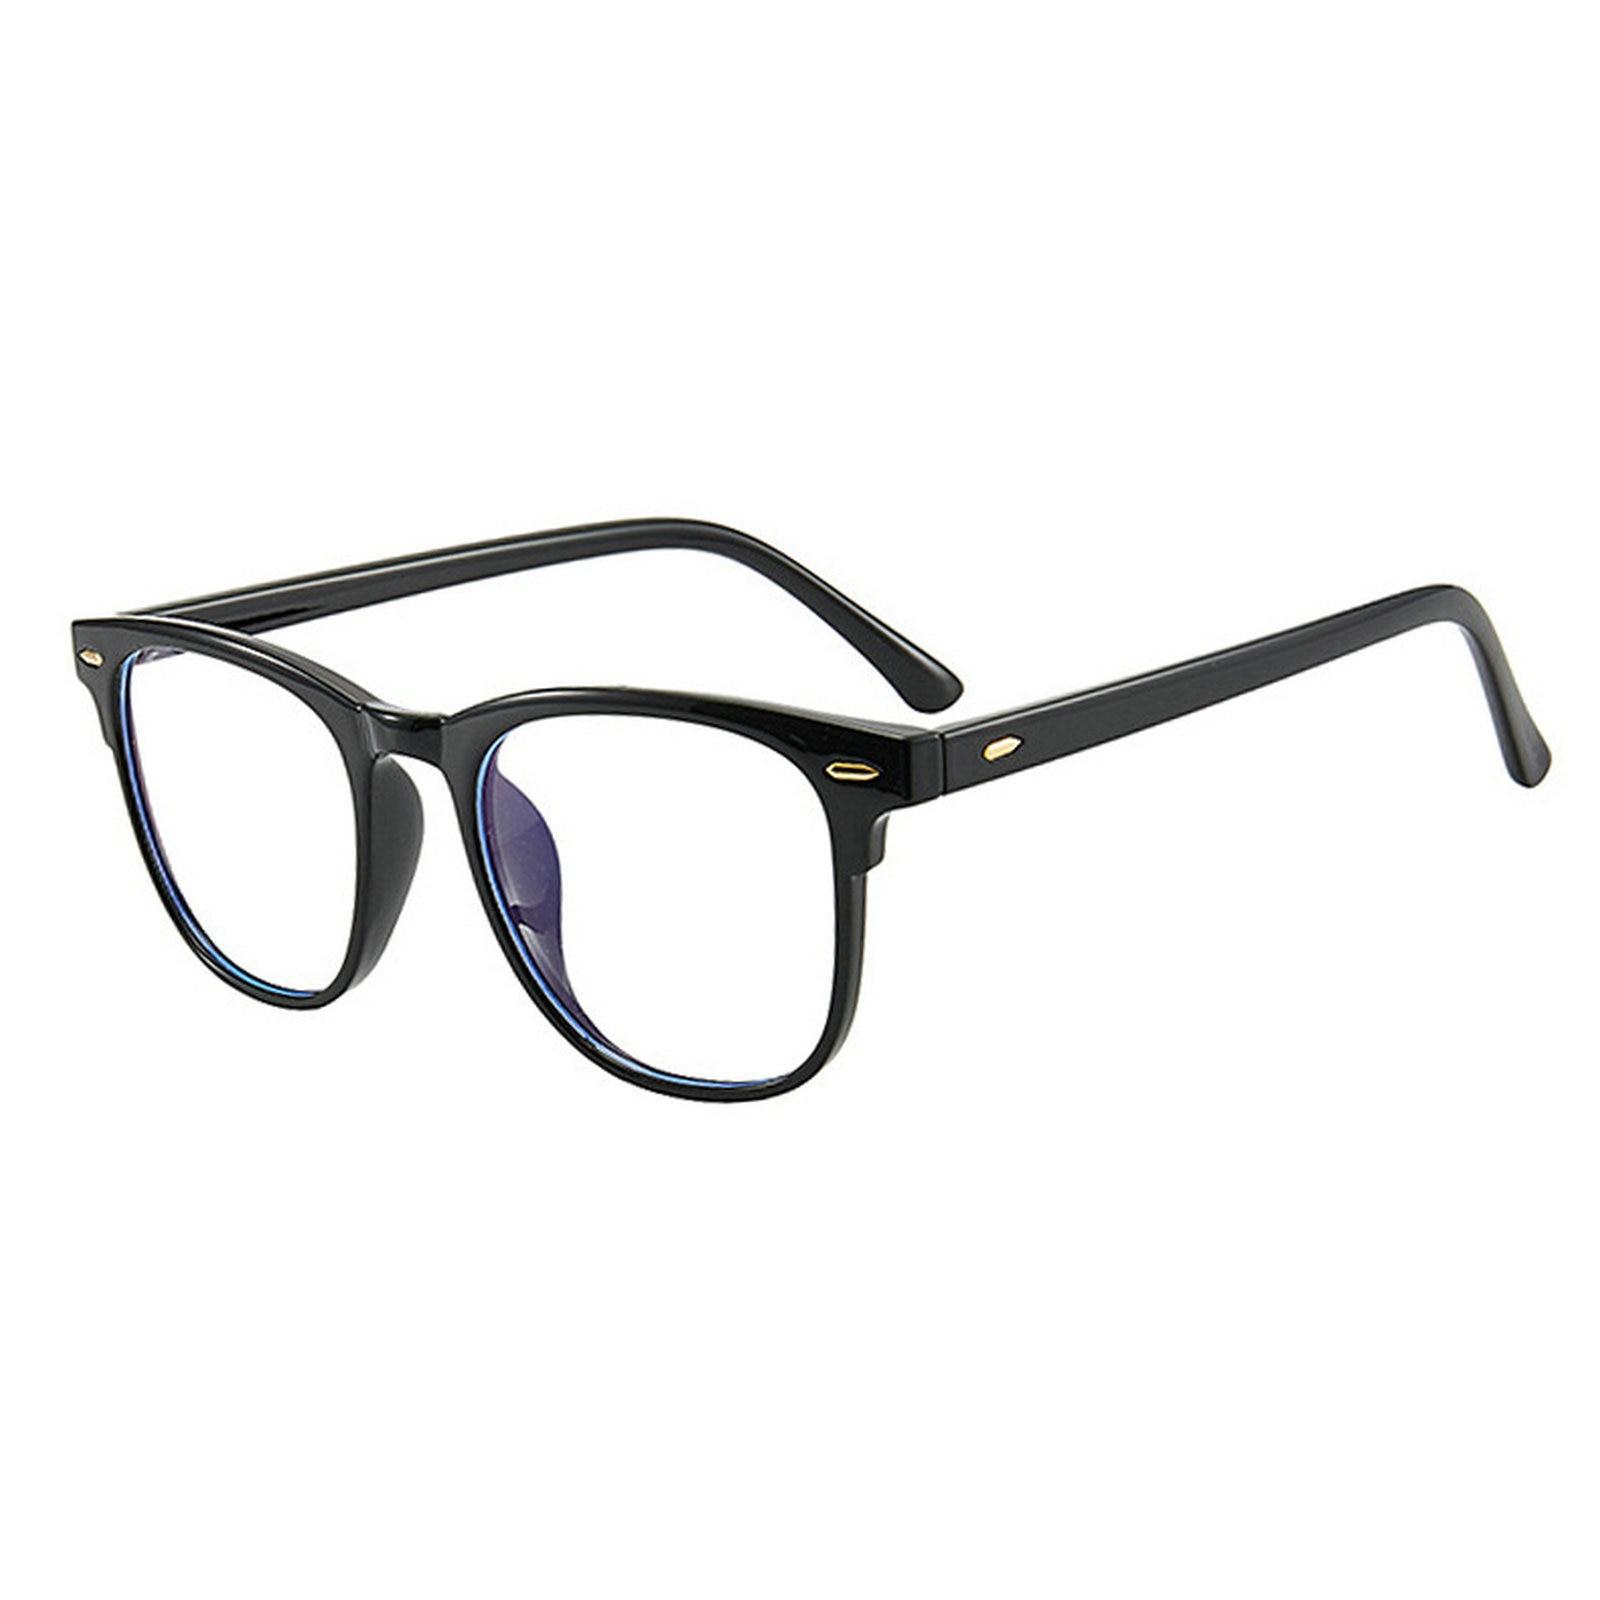 Reading Glasses Men Women Anti blue light Hyperopia Eyewear Presbyopic Glasses Diopter Anti-UV glasses FML sys0076 3 0 diopter reading presbyopic glasses black